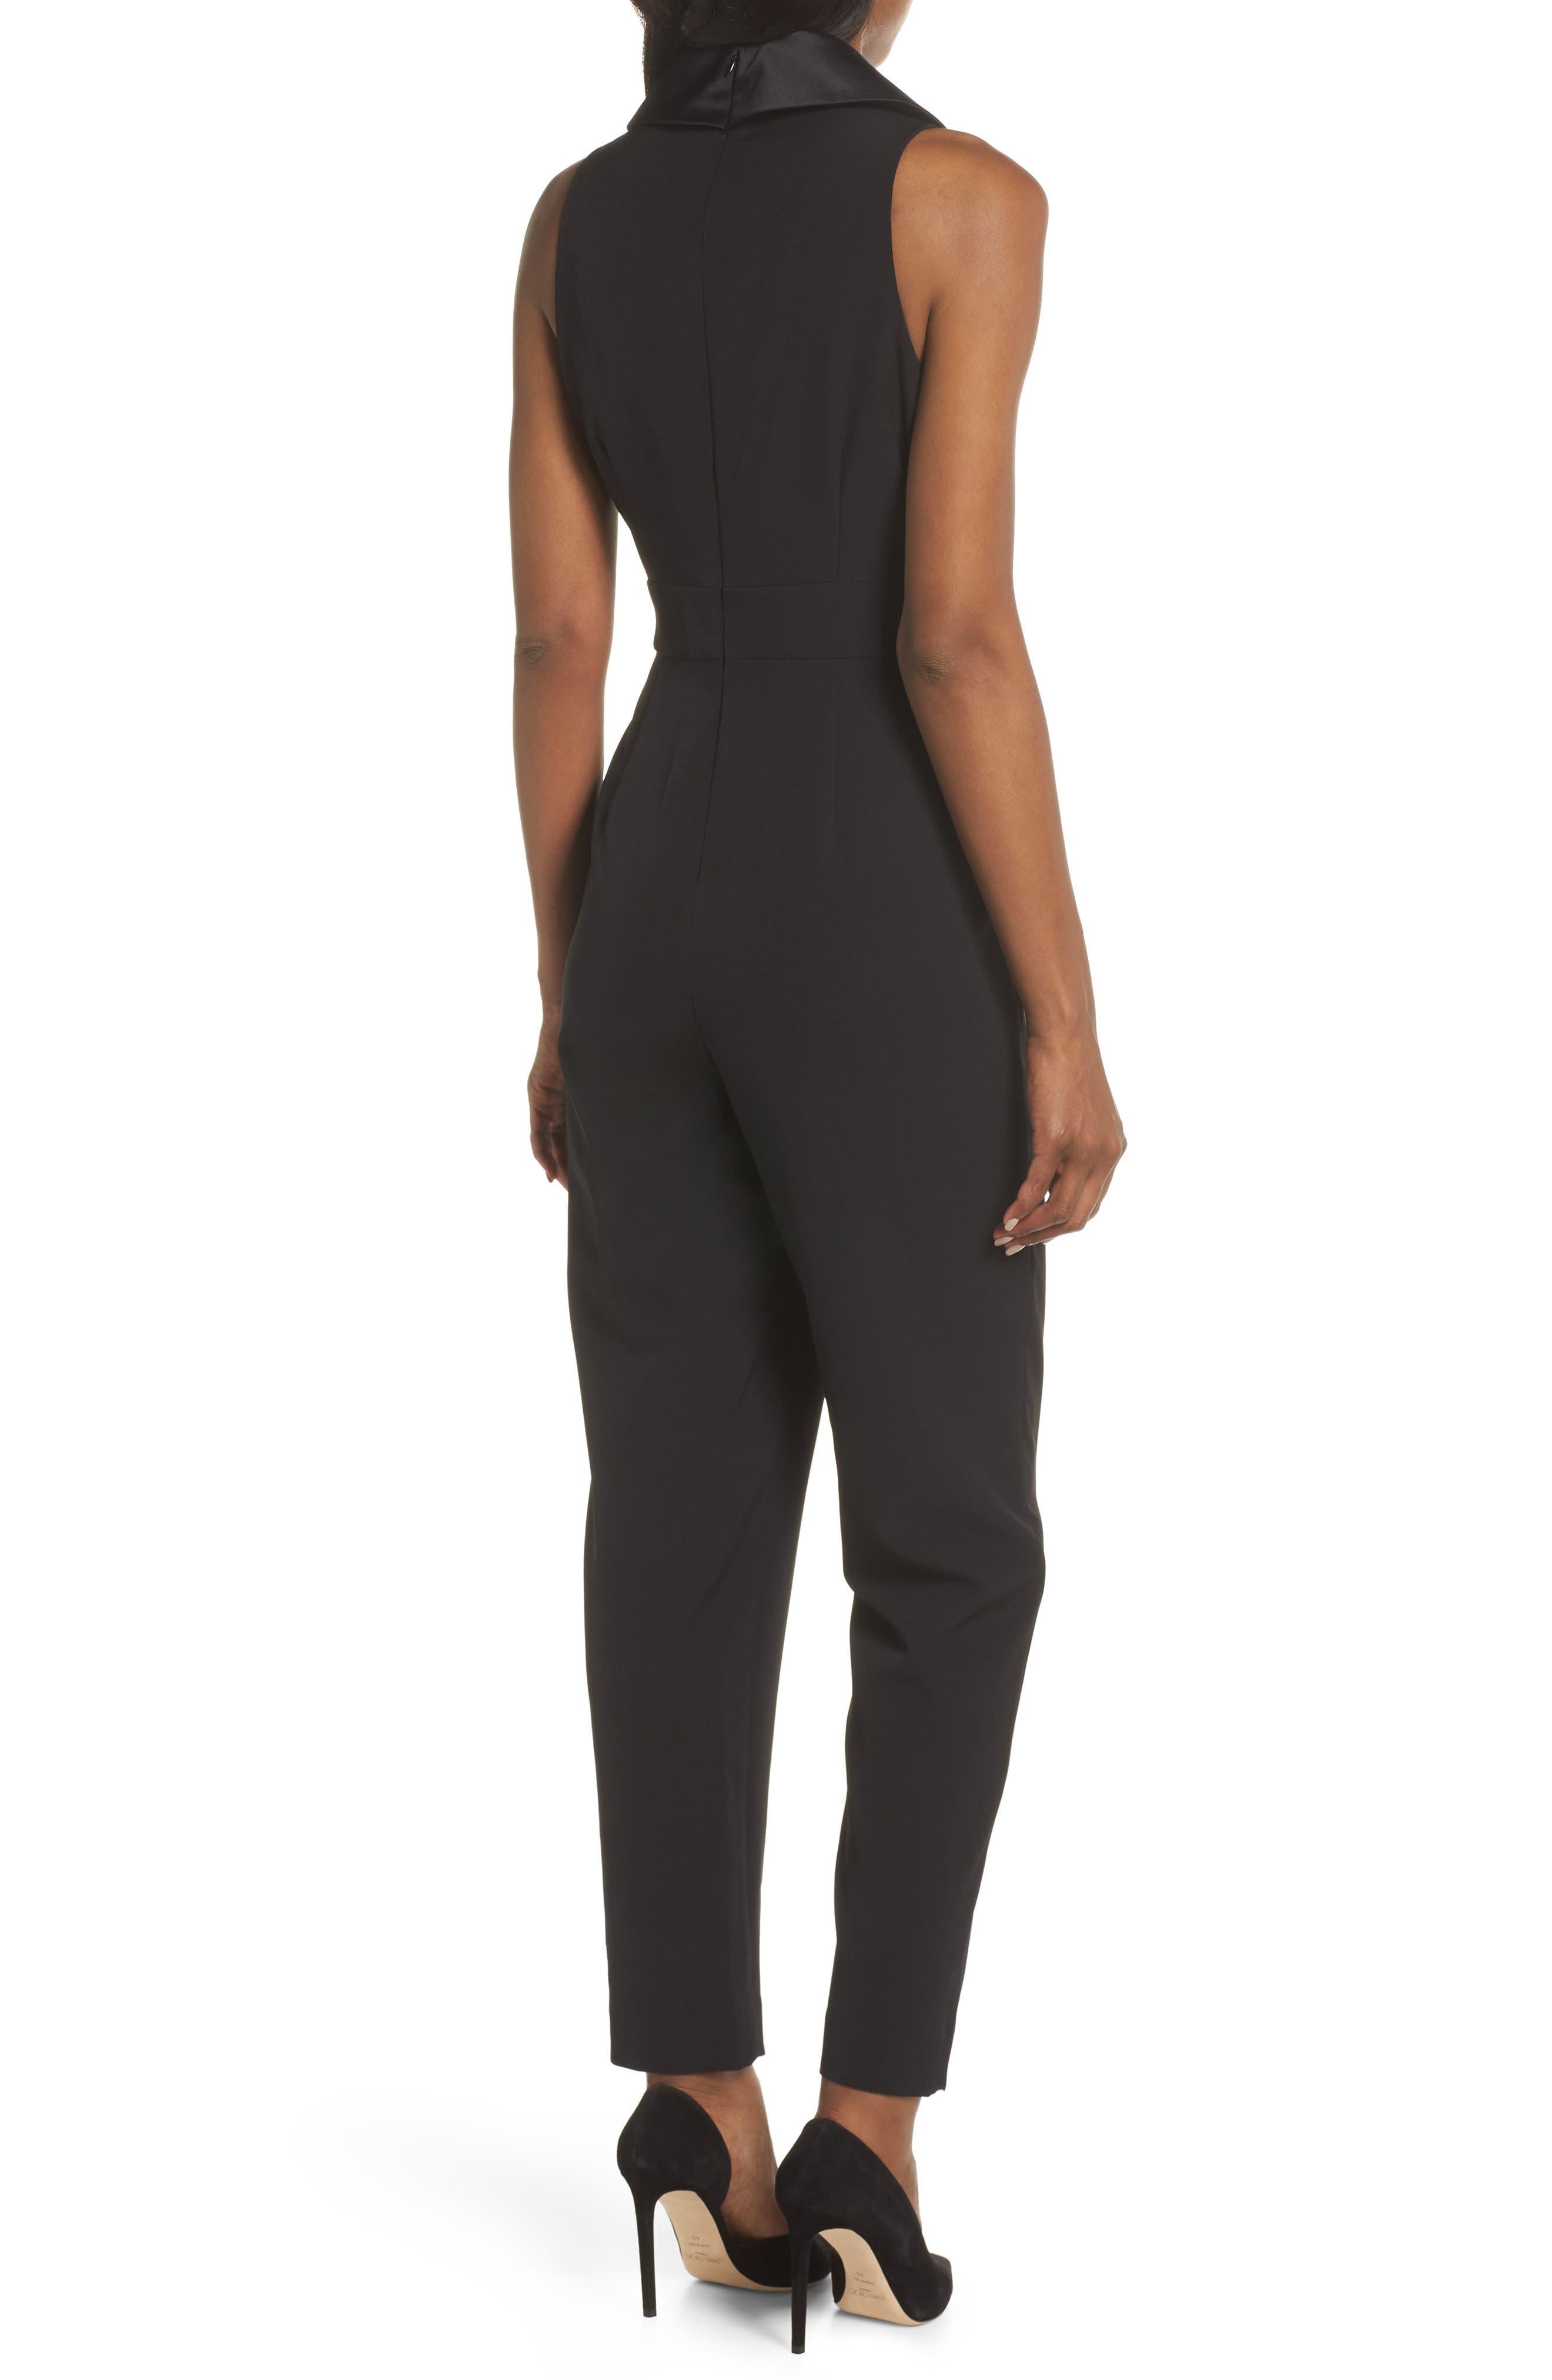 ELIZA J, Tuxedo Jumpsuit, Alternate thumbnail 2, color, BLACK